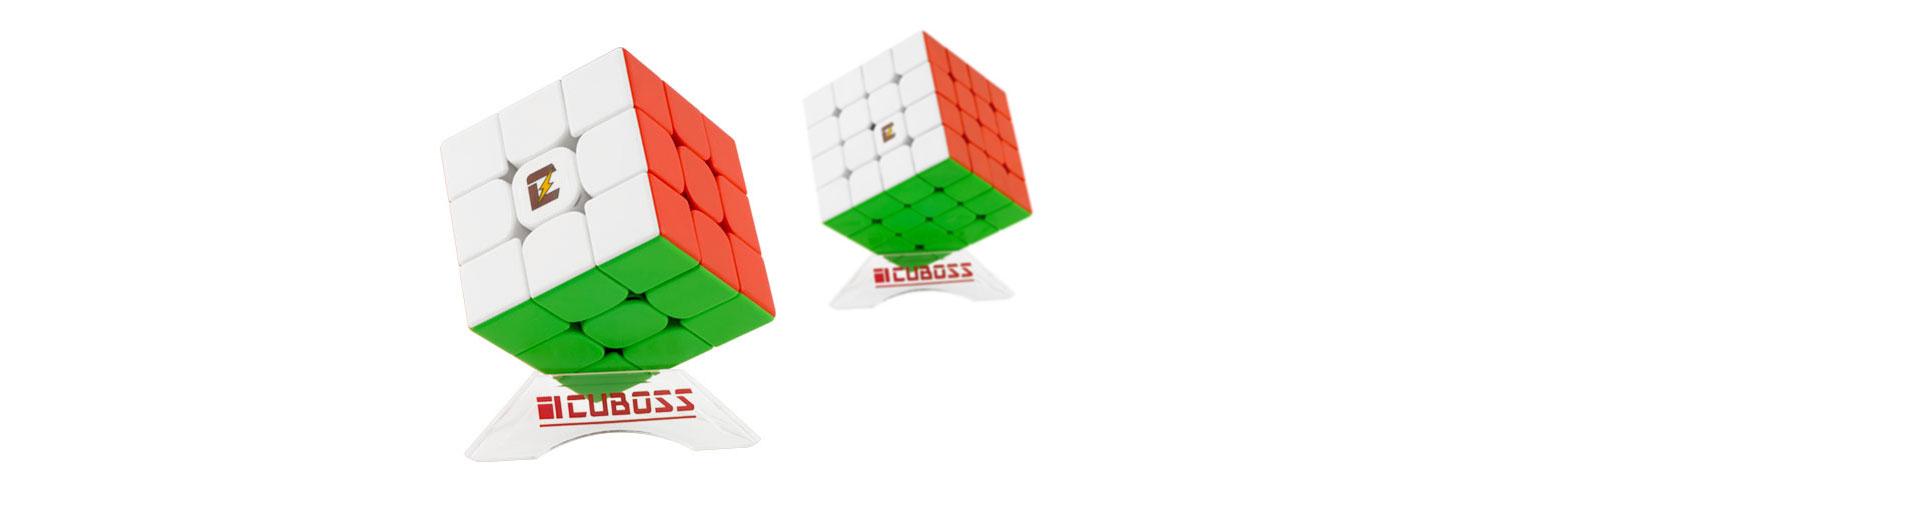 cuboss-impact-banner-image